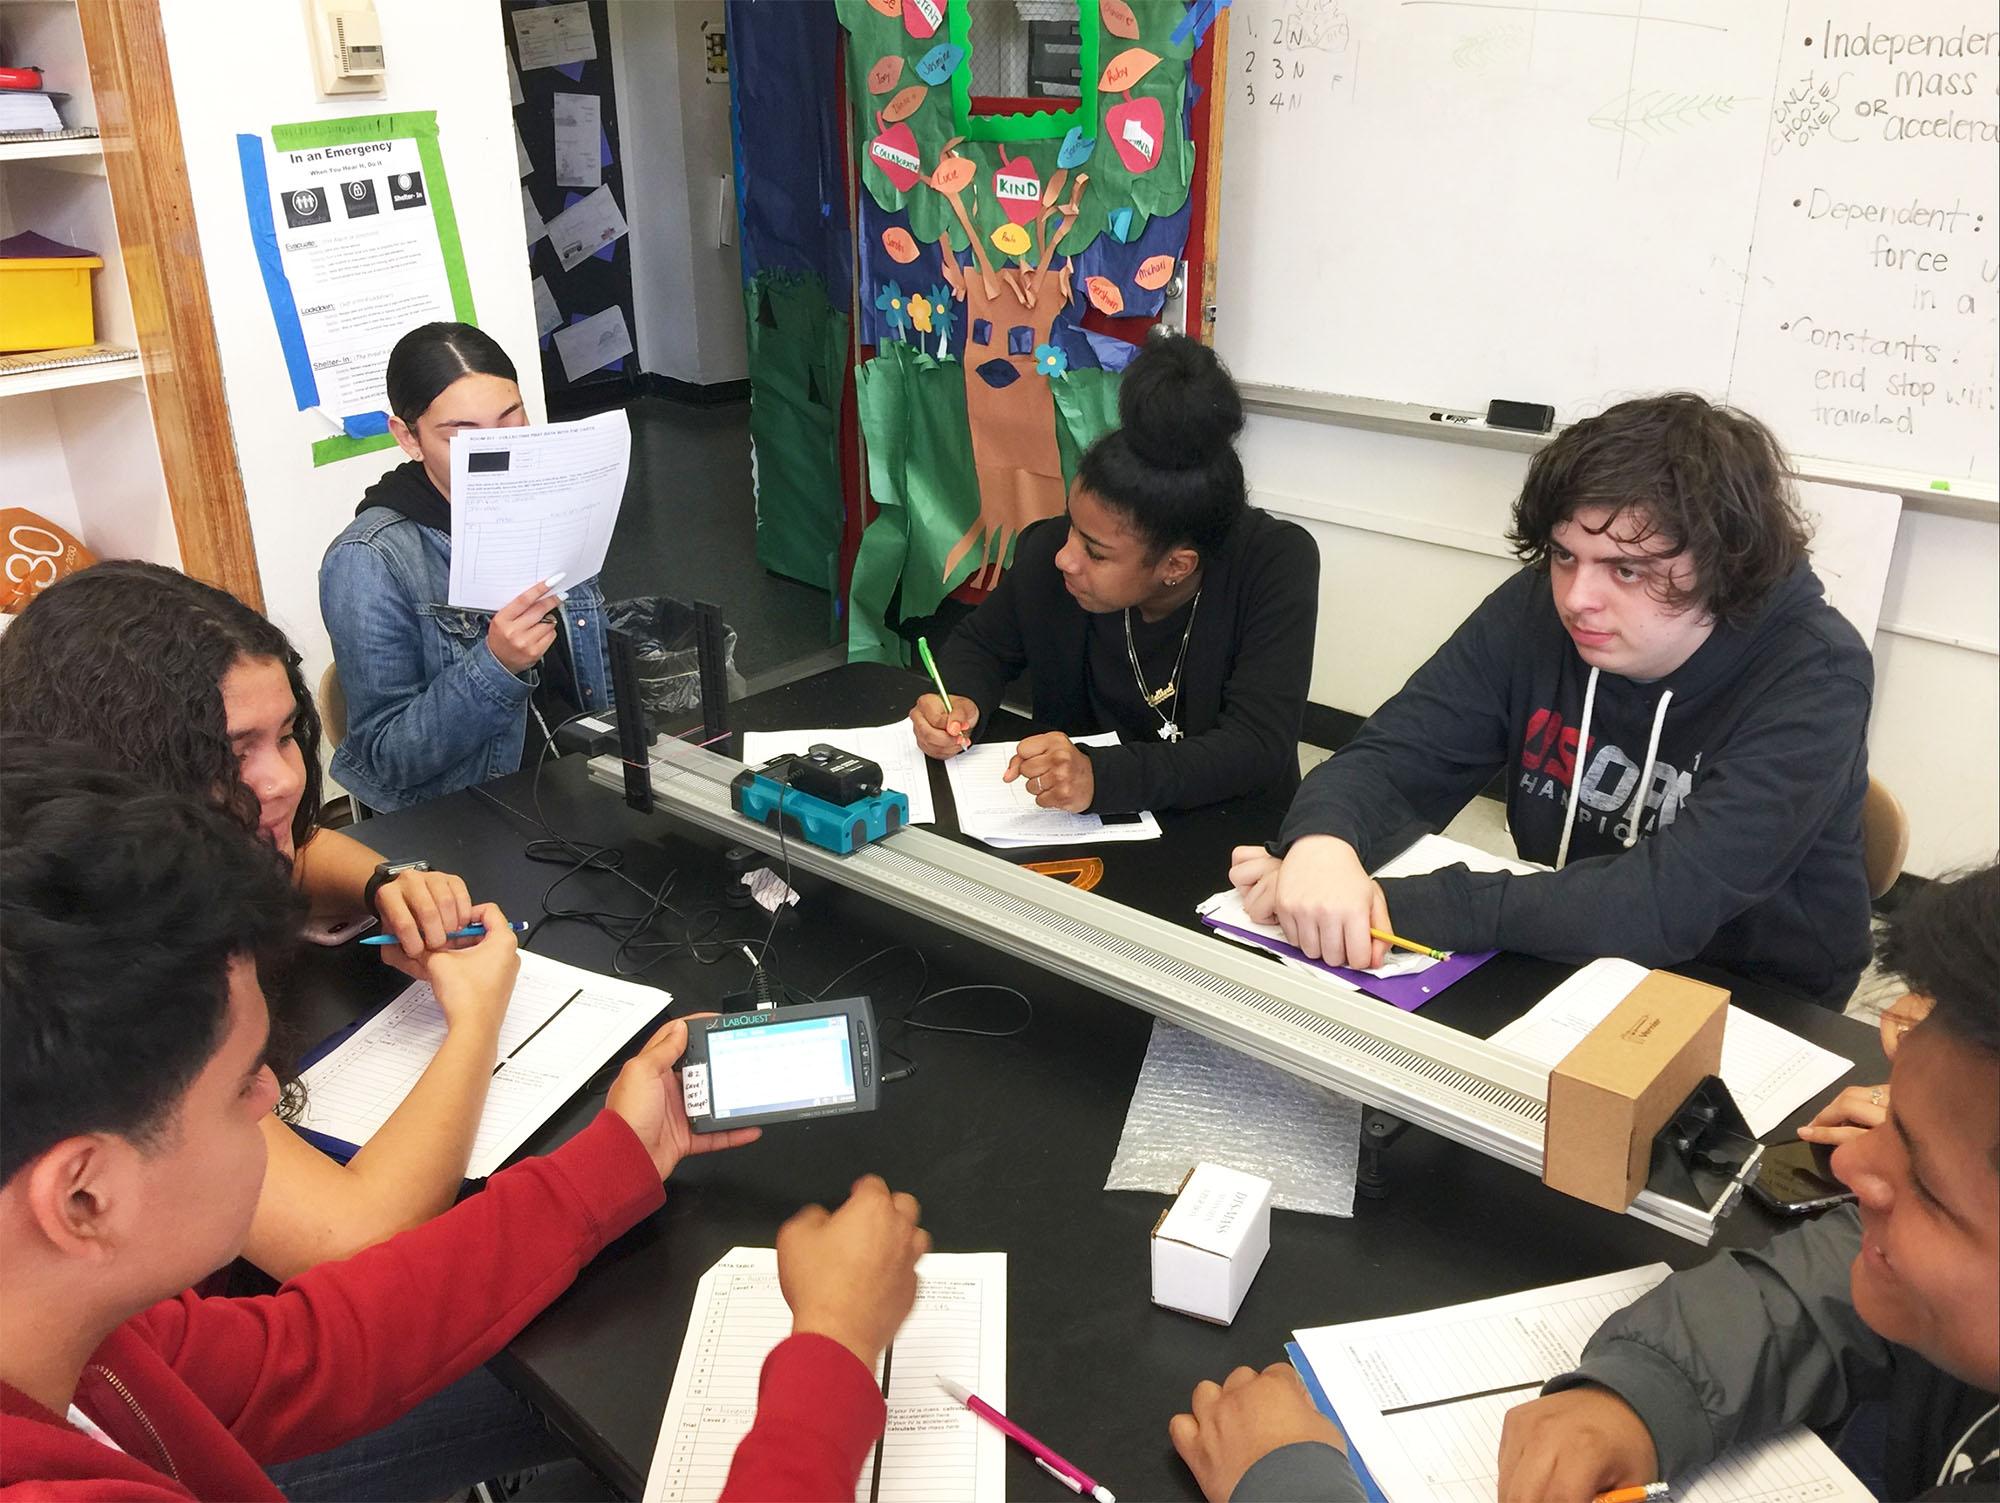 PhysicsStudents2_large.jpg